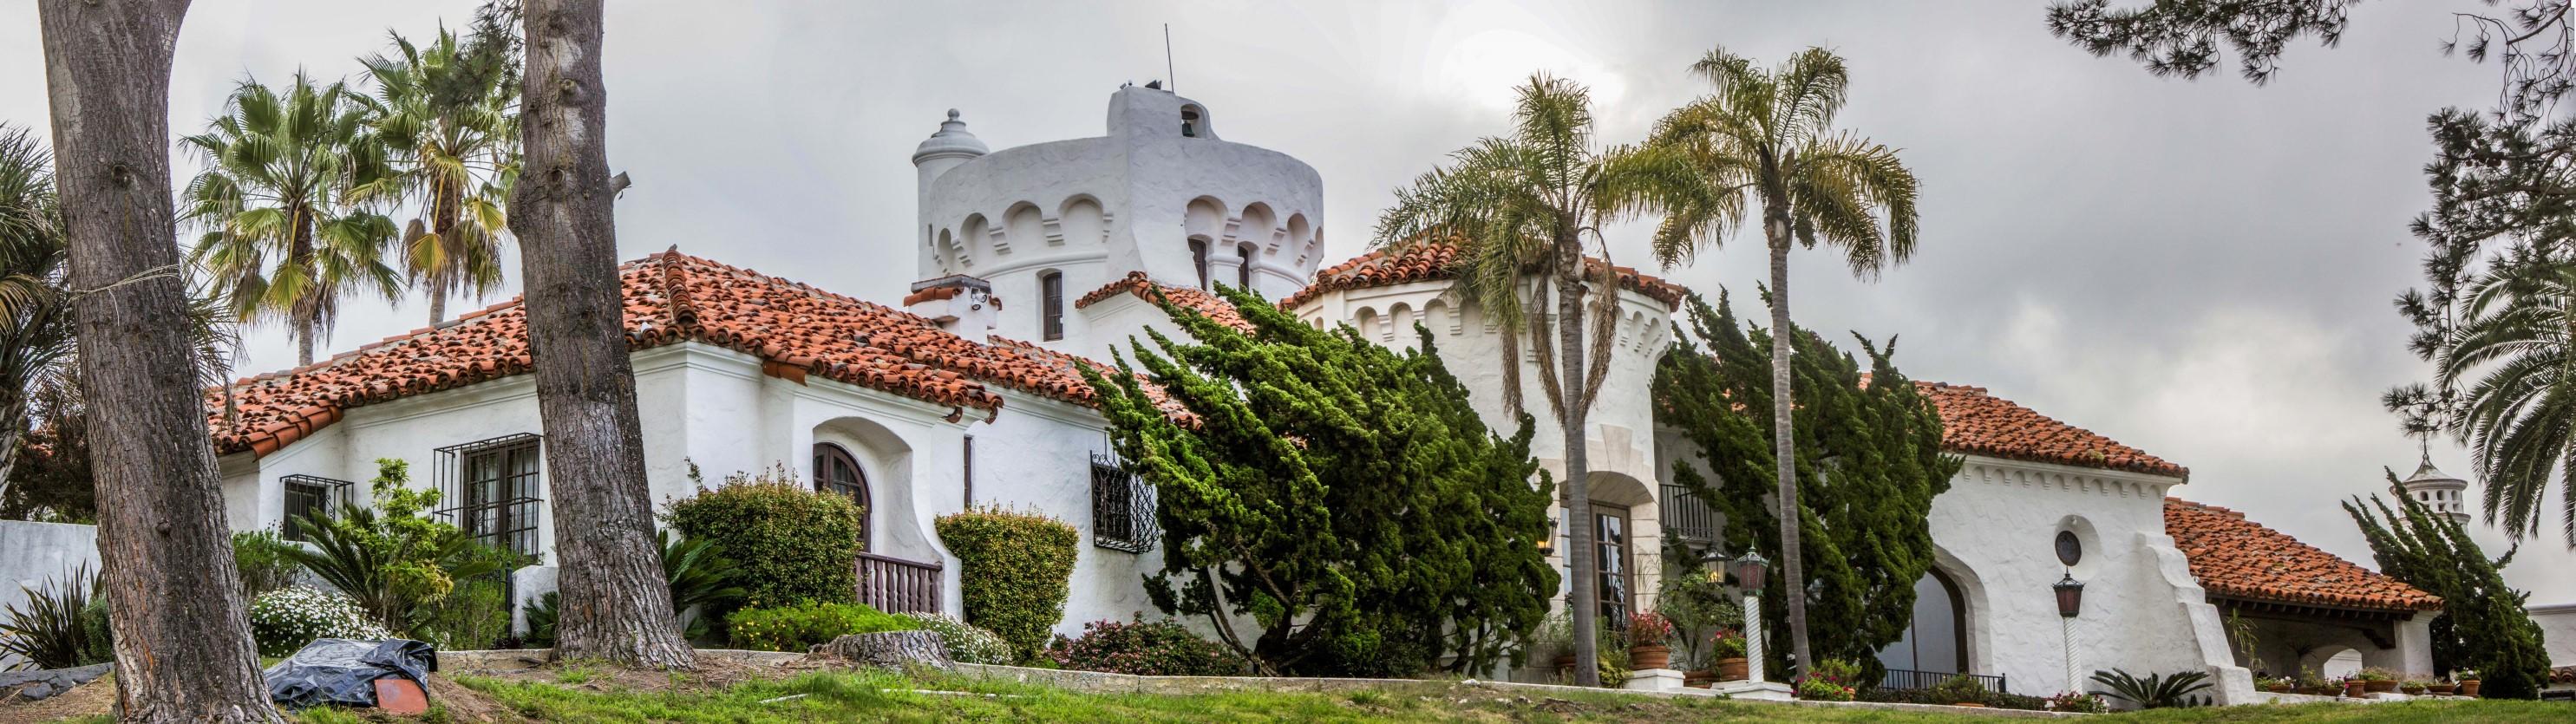 The Del Mar Castle Near San Diego California Russel Ray